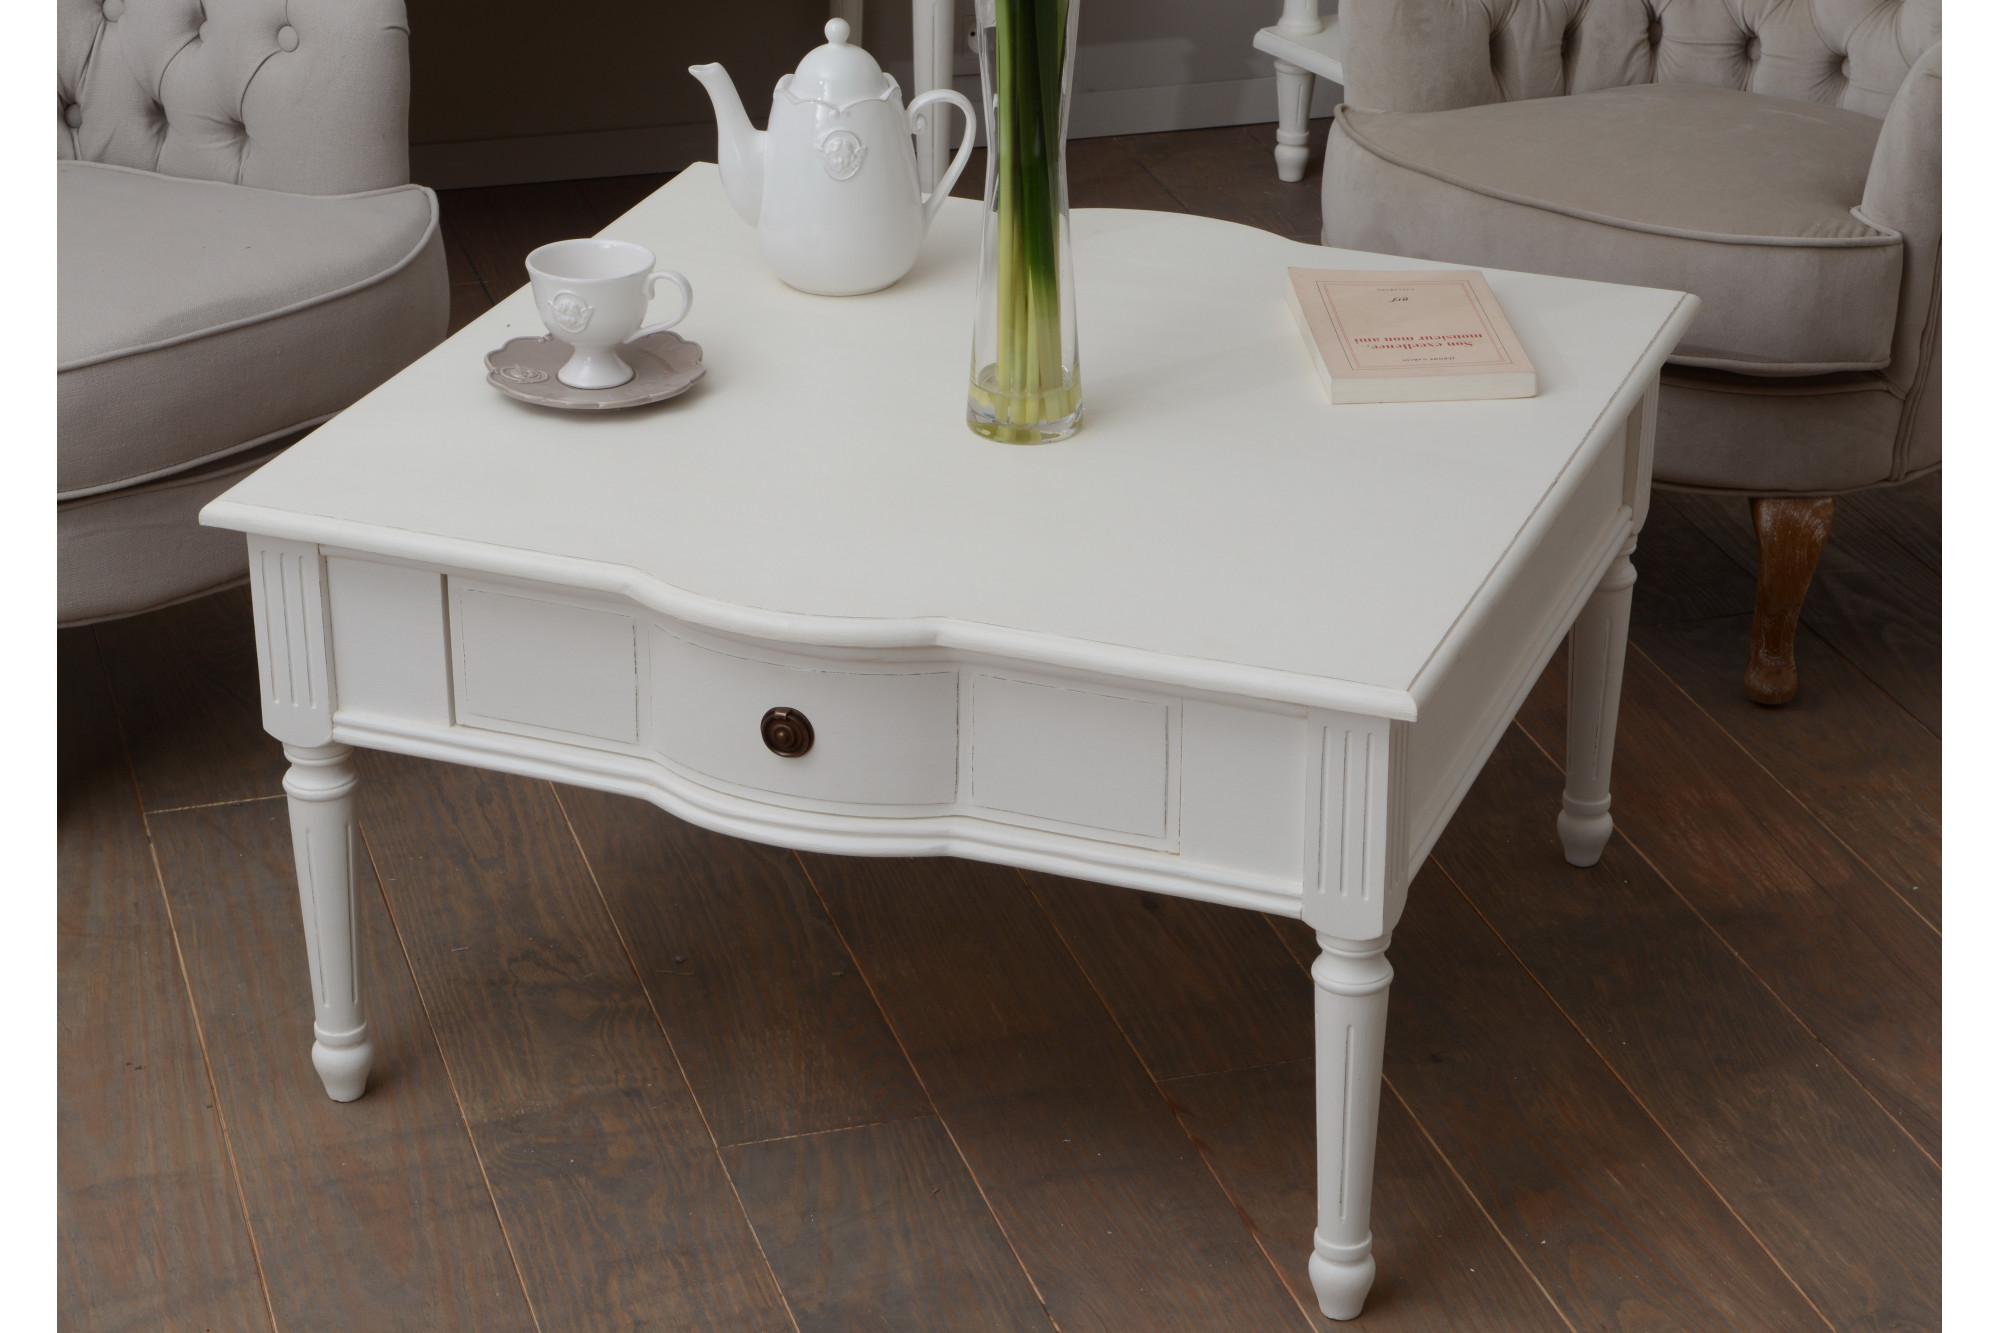 Table basse carr e romantique en bois hellin Grande table carree